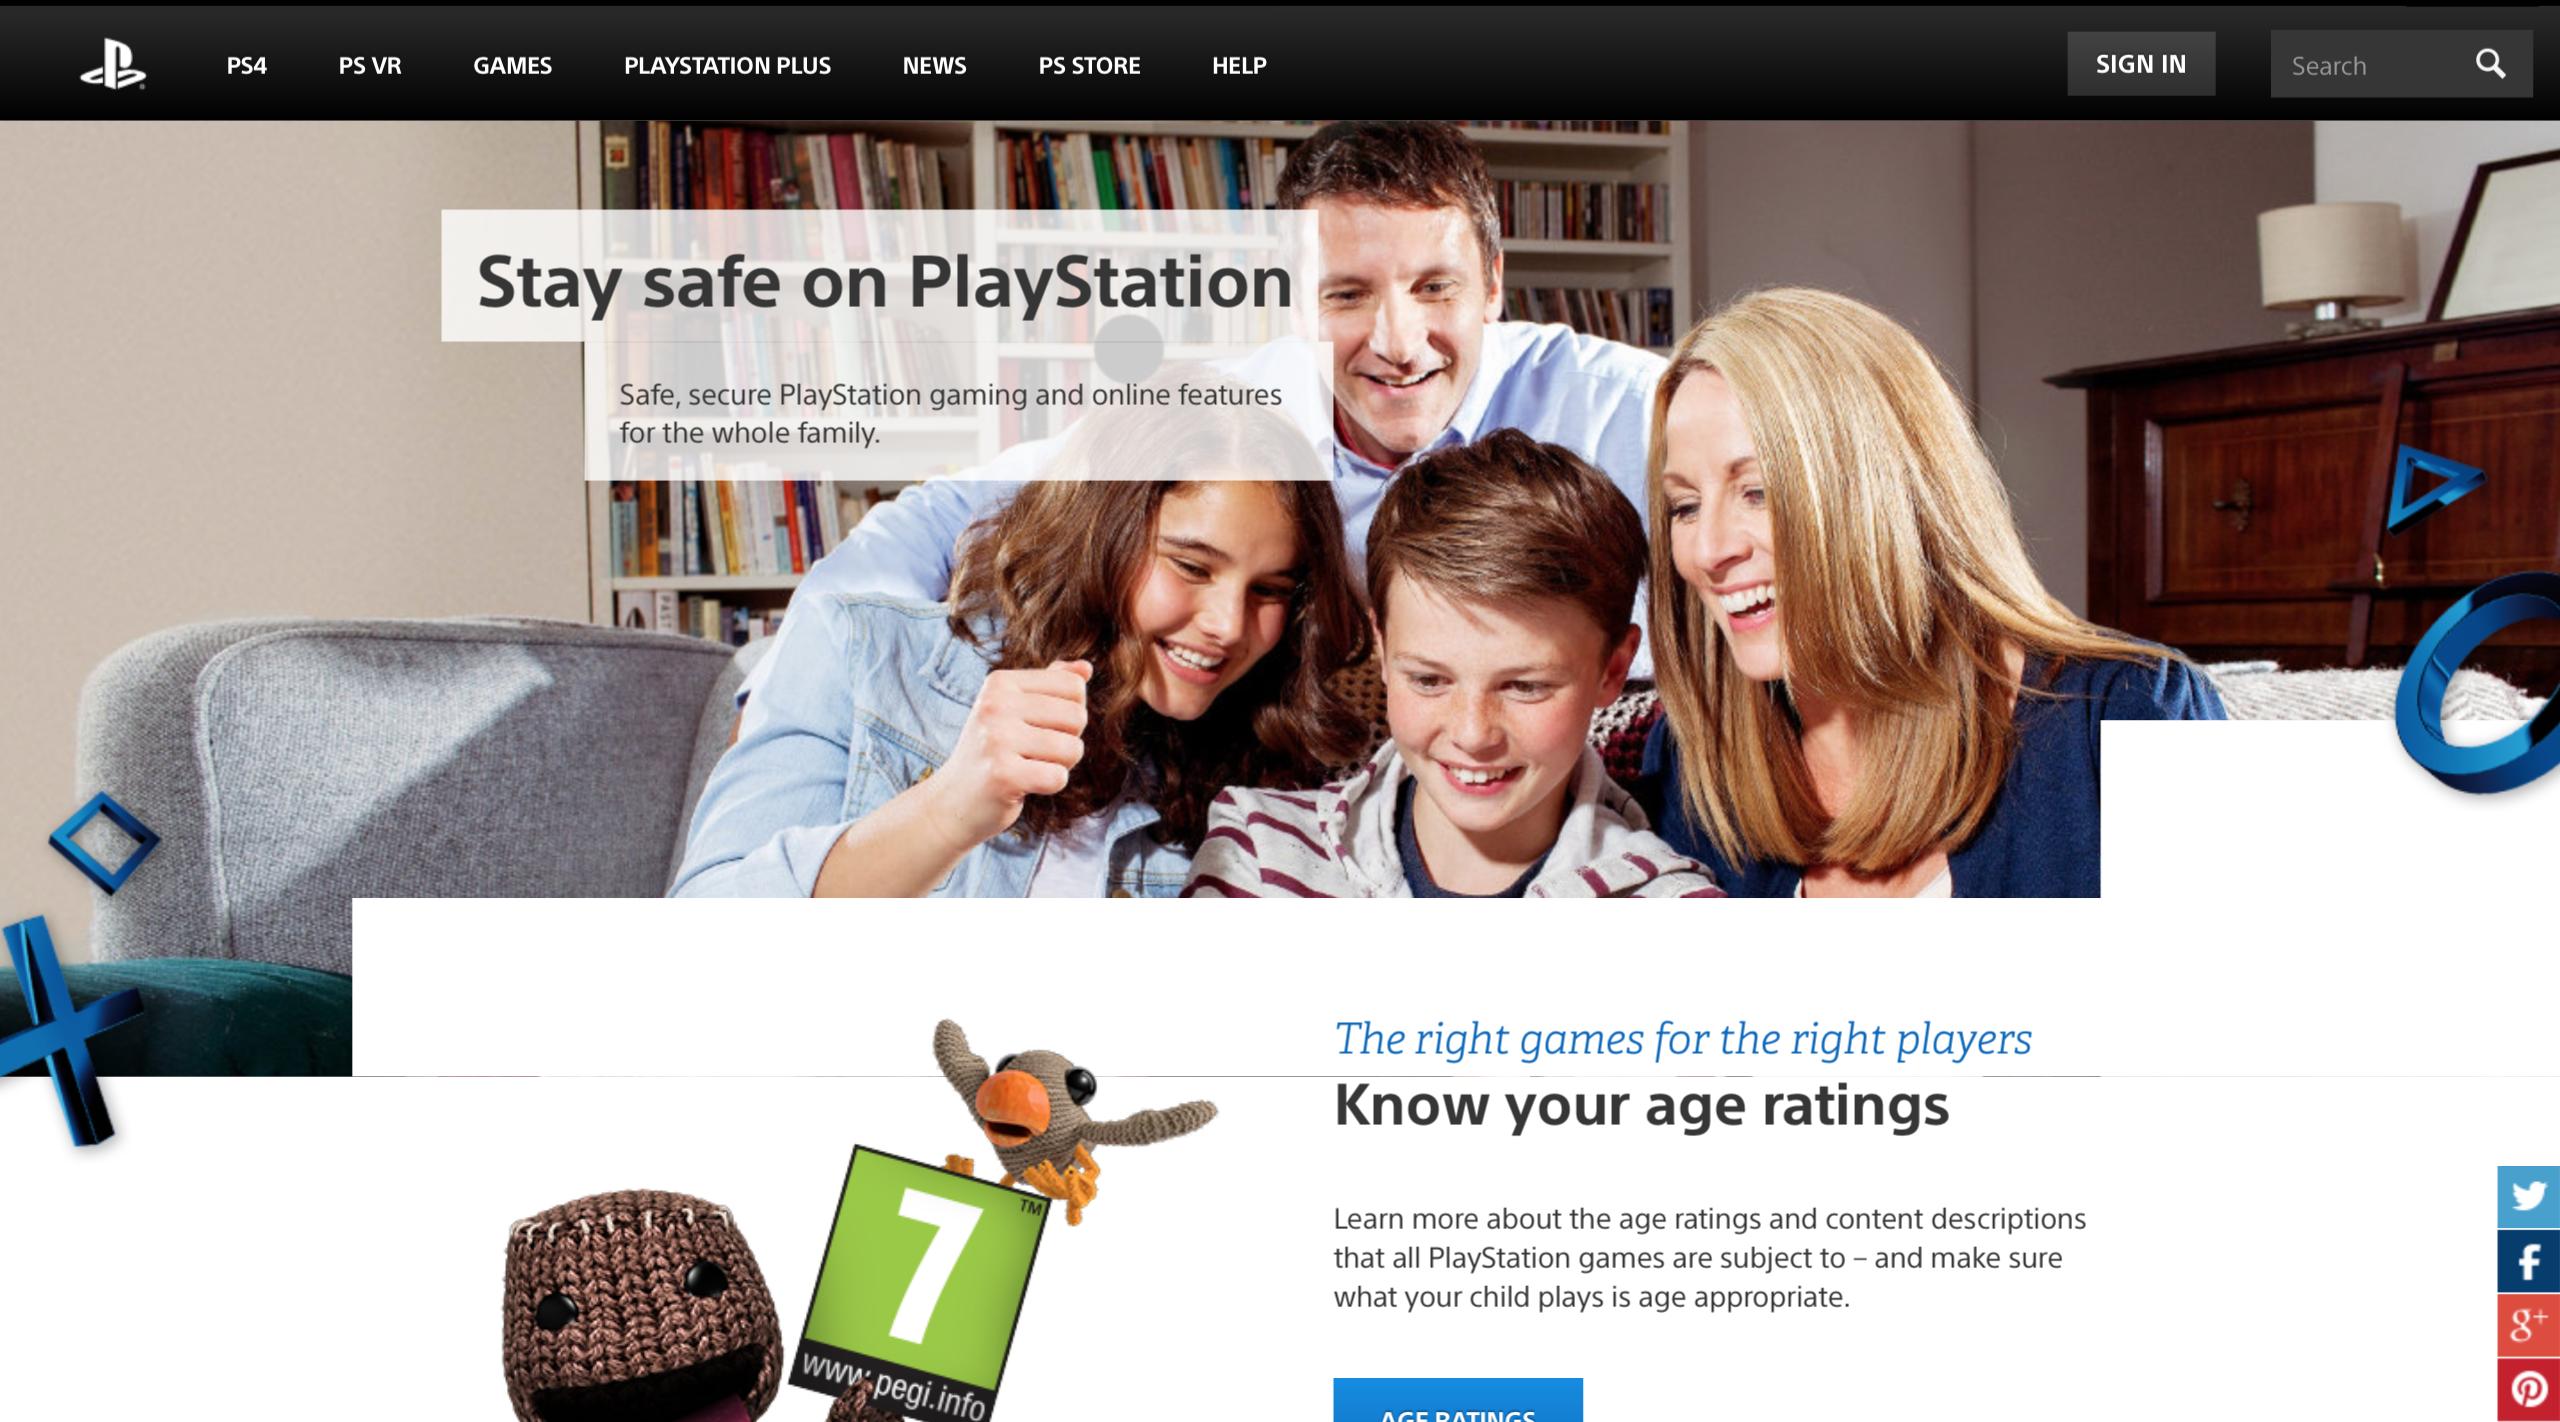 Playstation guidance